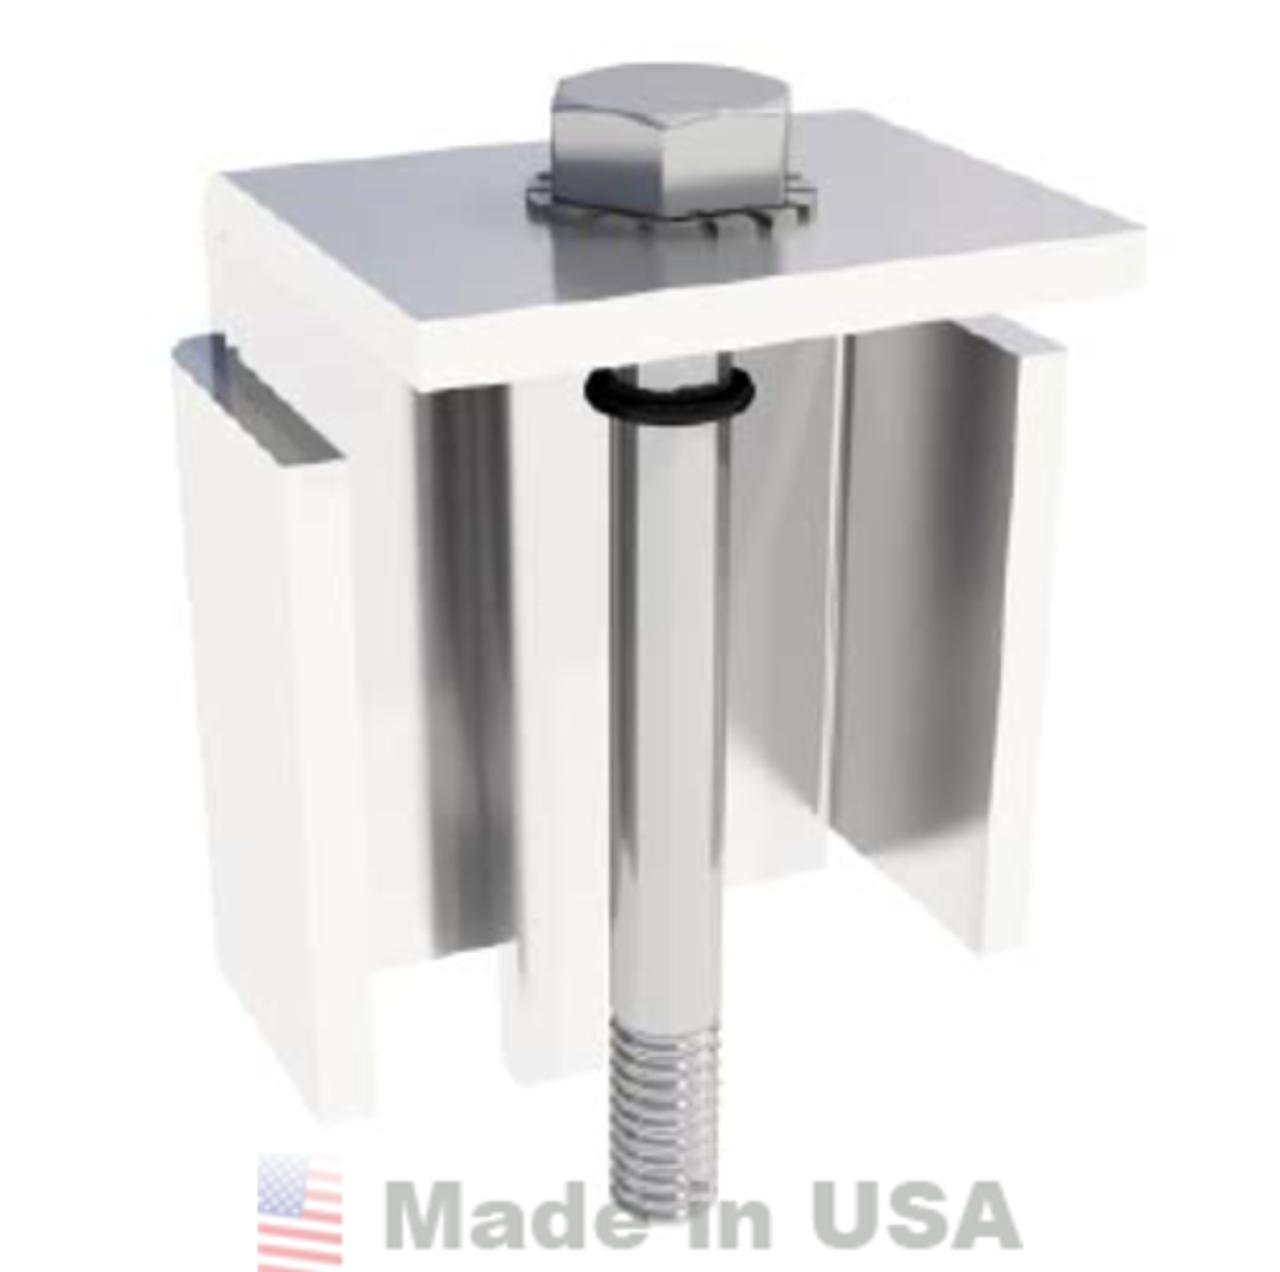 IronRidge BRM Ballast Module Clamp (Fits 35.5mm - 36.4mm)